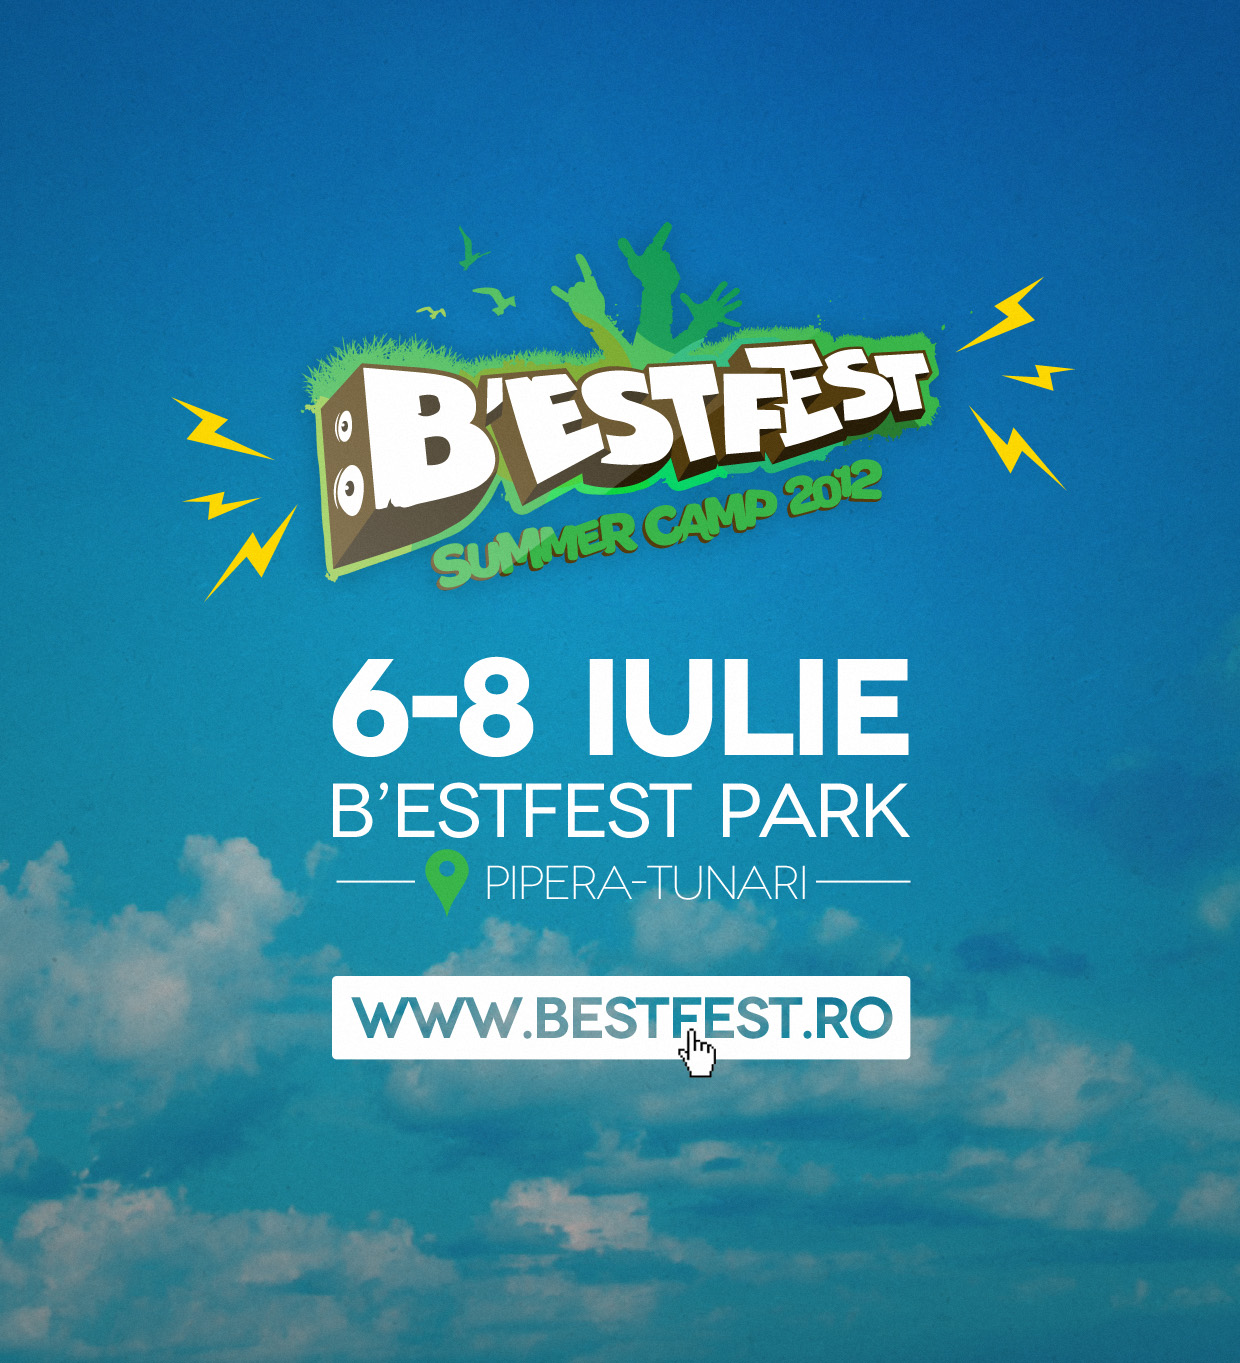 B'ESTFEST Summer Camp 2012